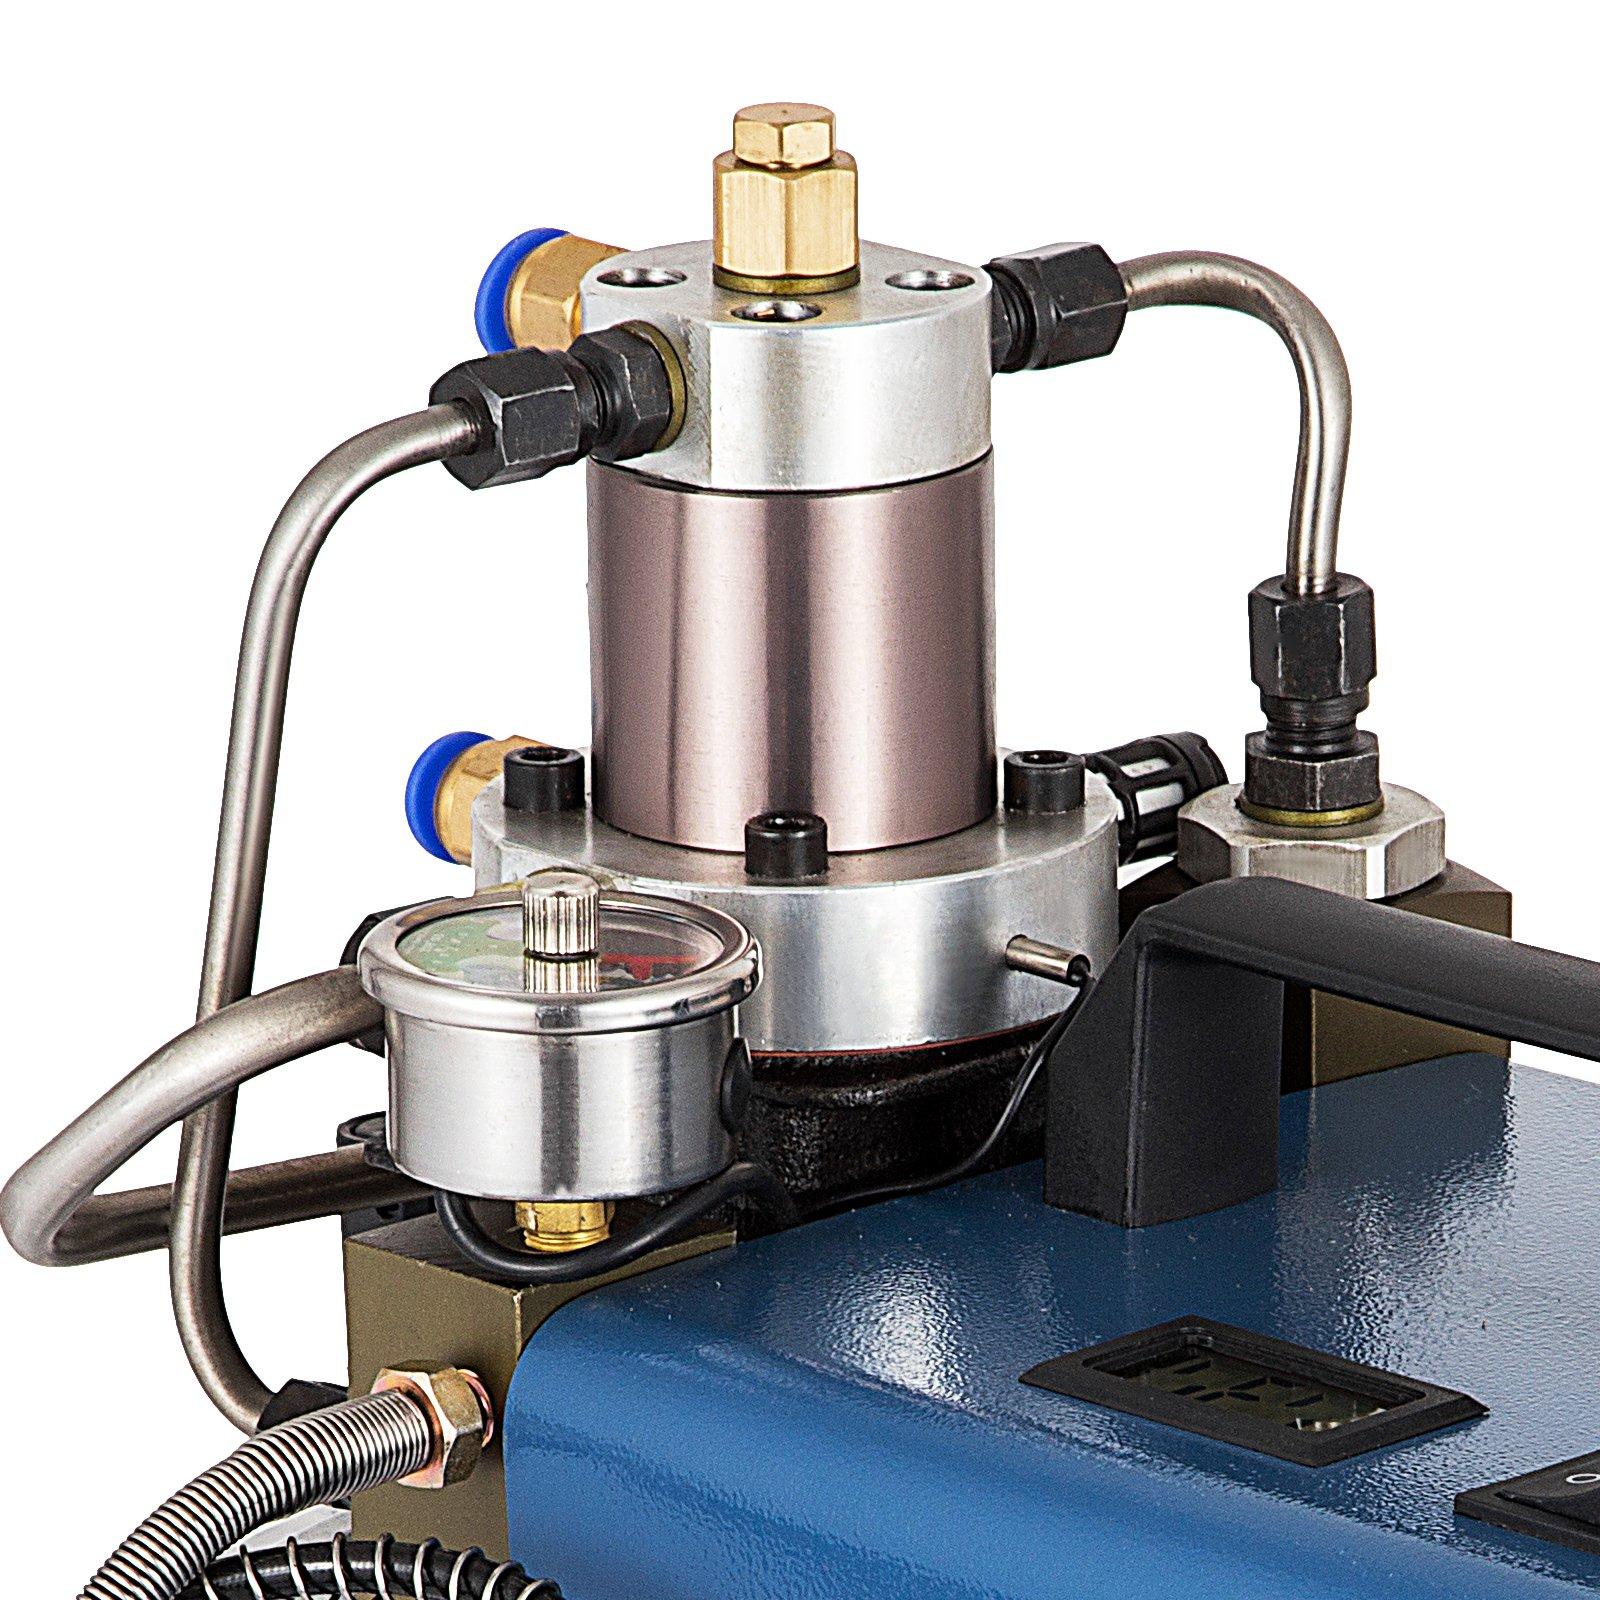 VEVOR High Pressure Air Pump 110V 30Mpa Air Compressor